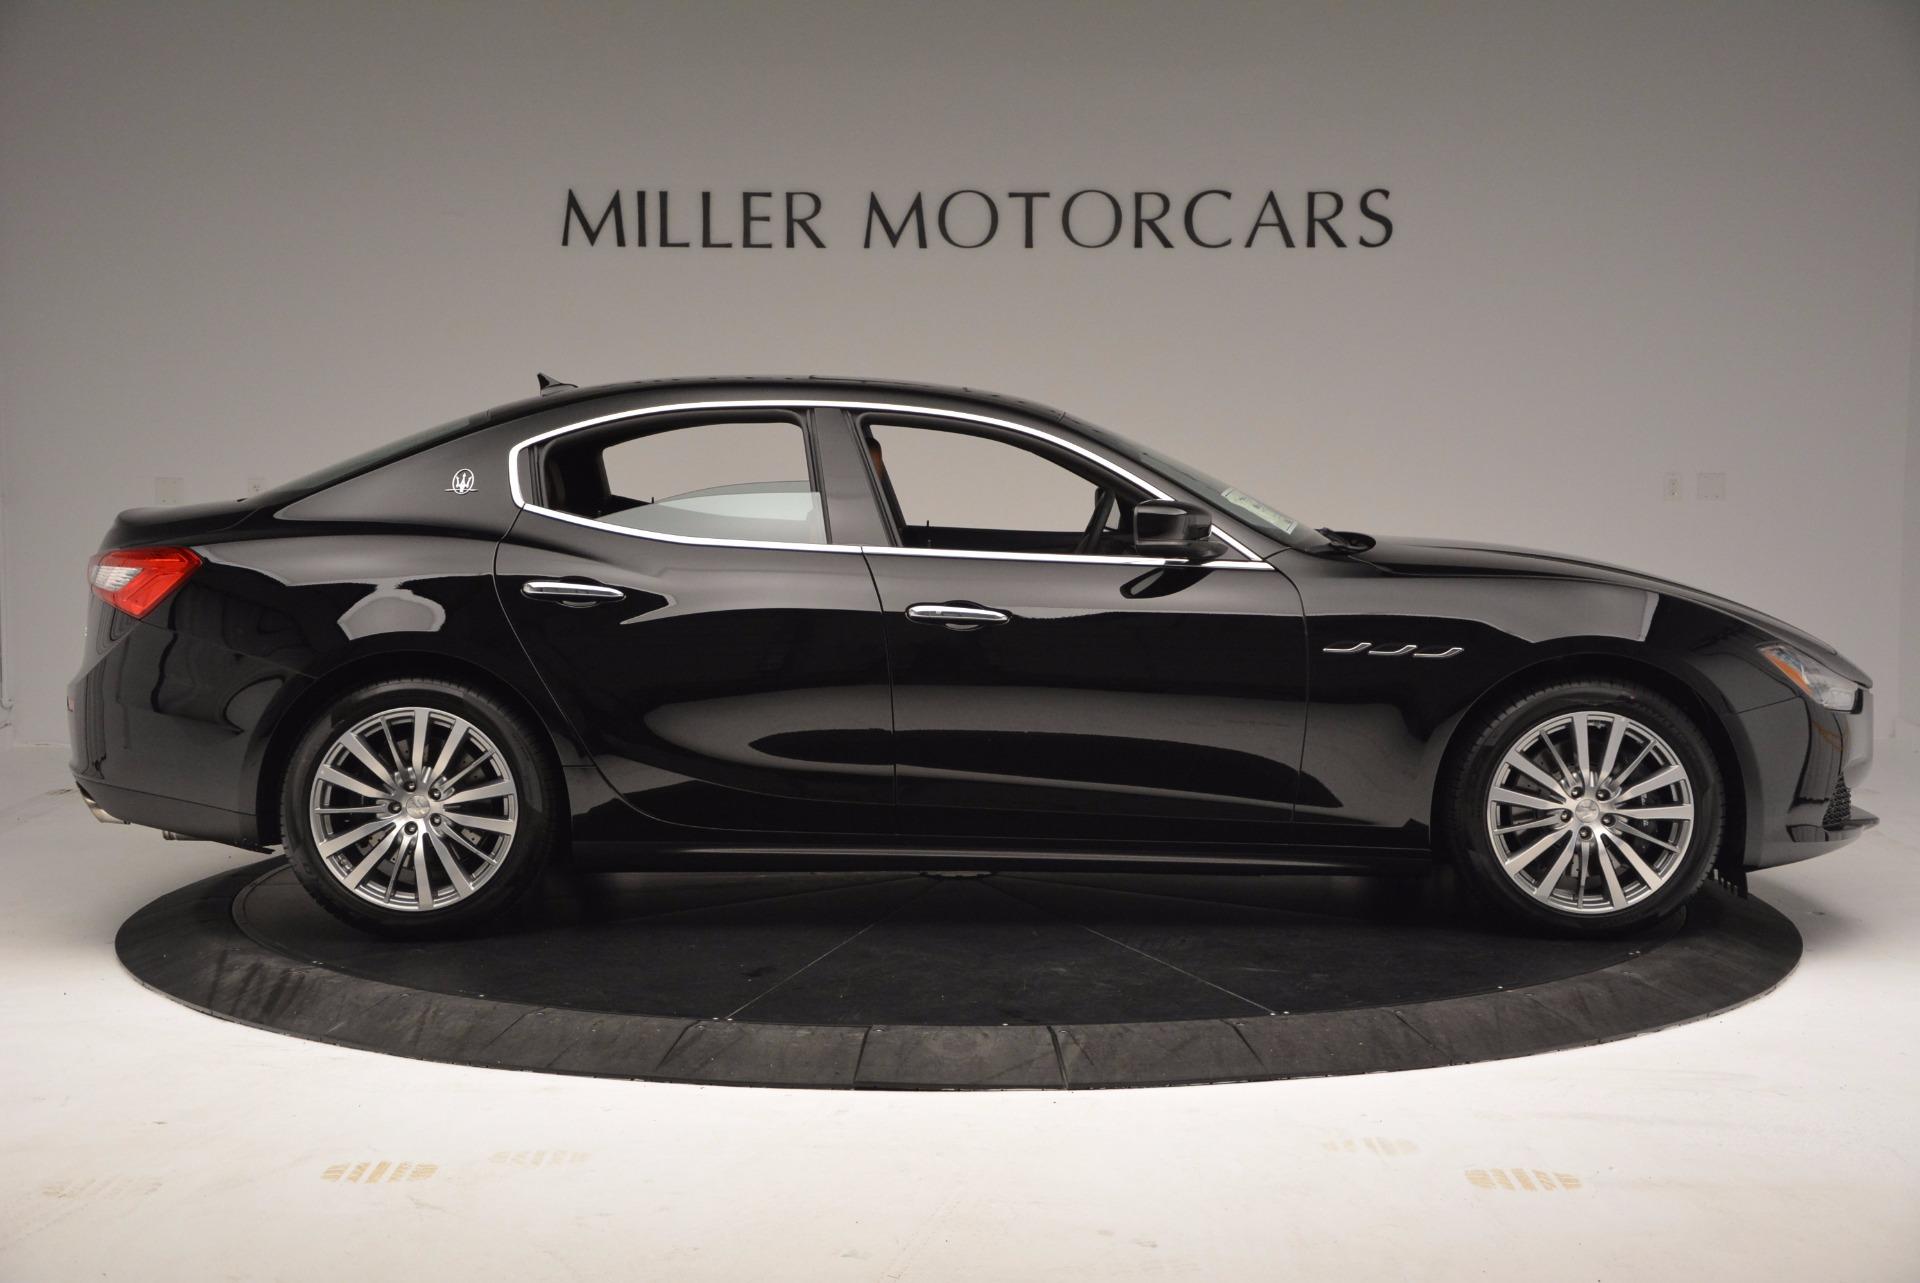 Used 2017 Maserati Ghibli S Q4 EX-Loaner For Sale In Greenwich, CT 776_p9